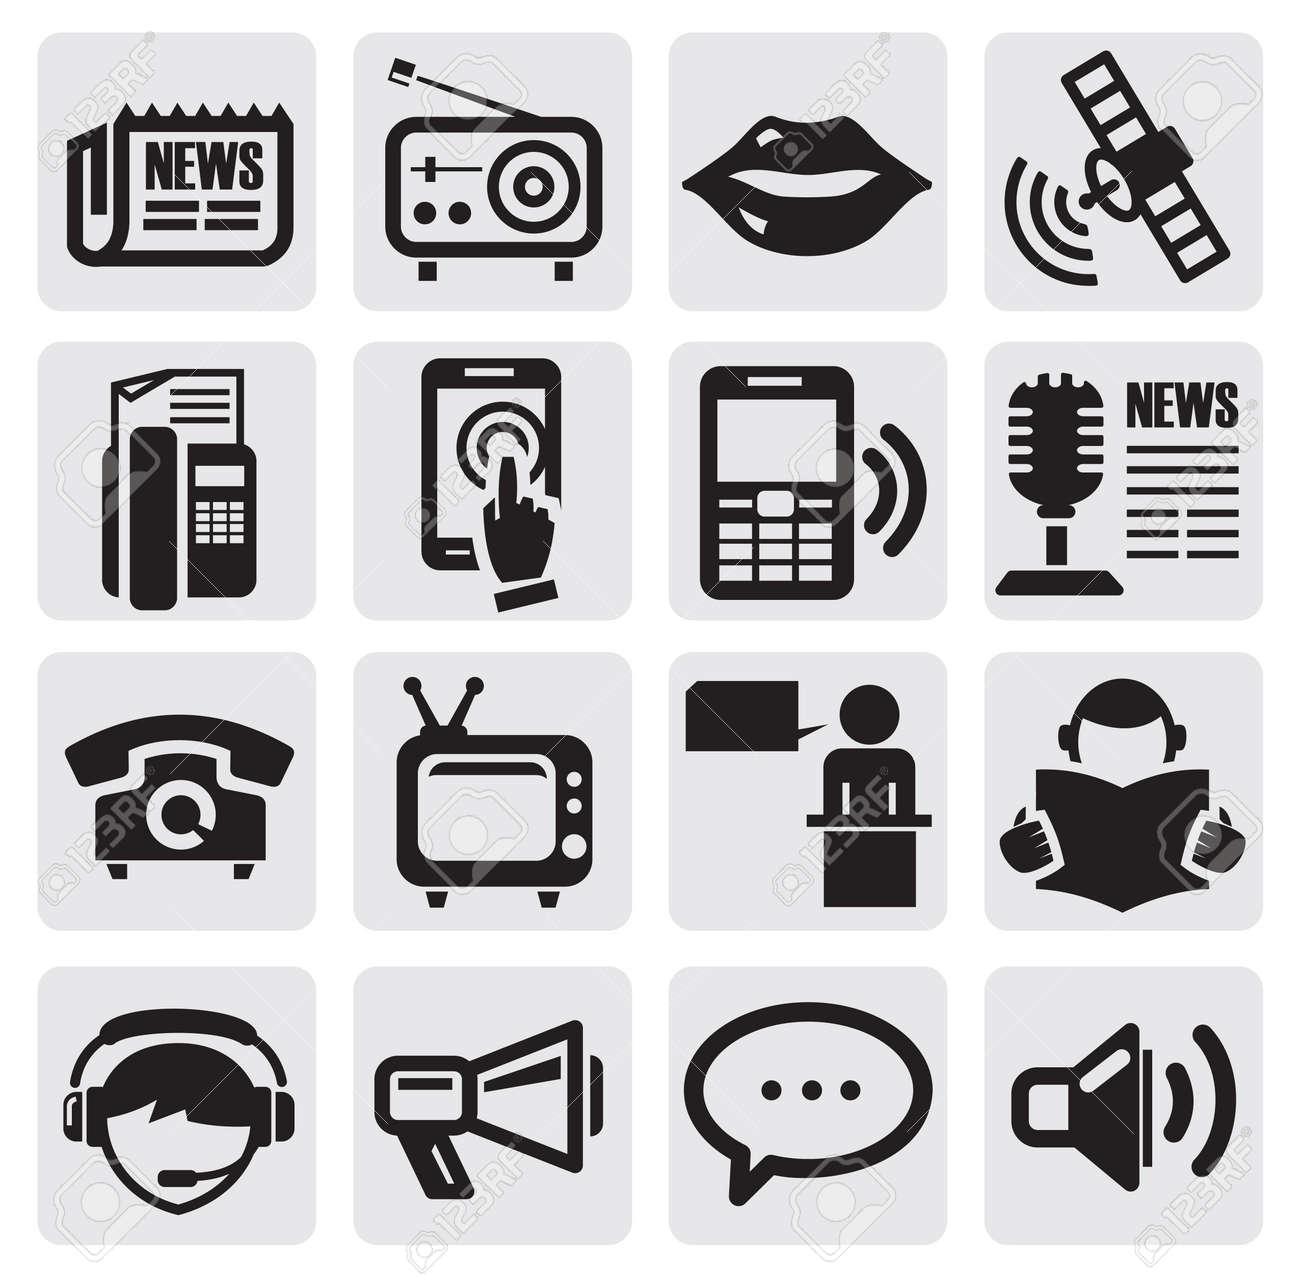 social media icons Stock Vector - 14855814